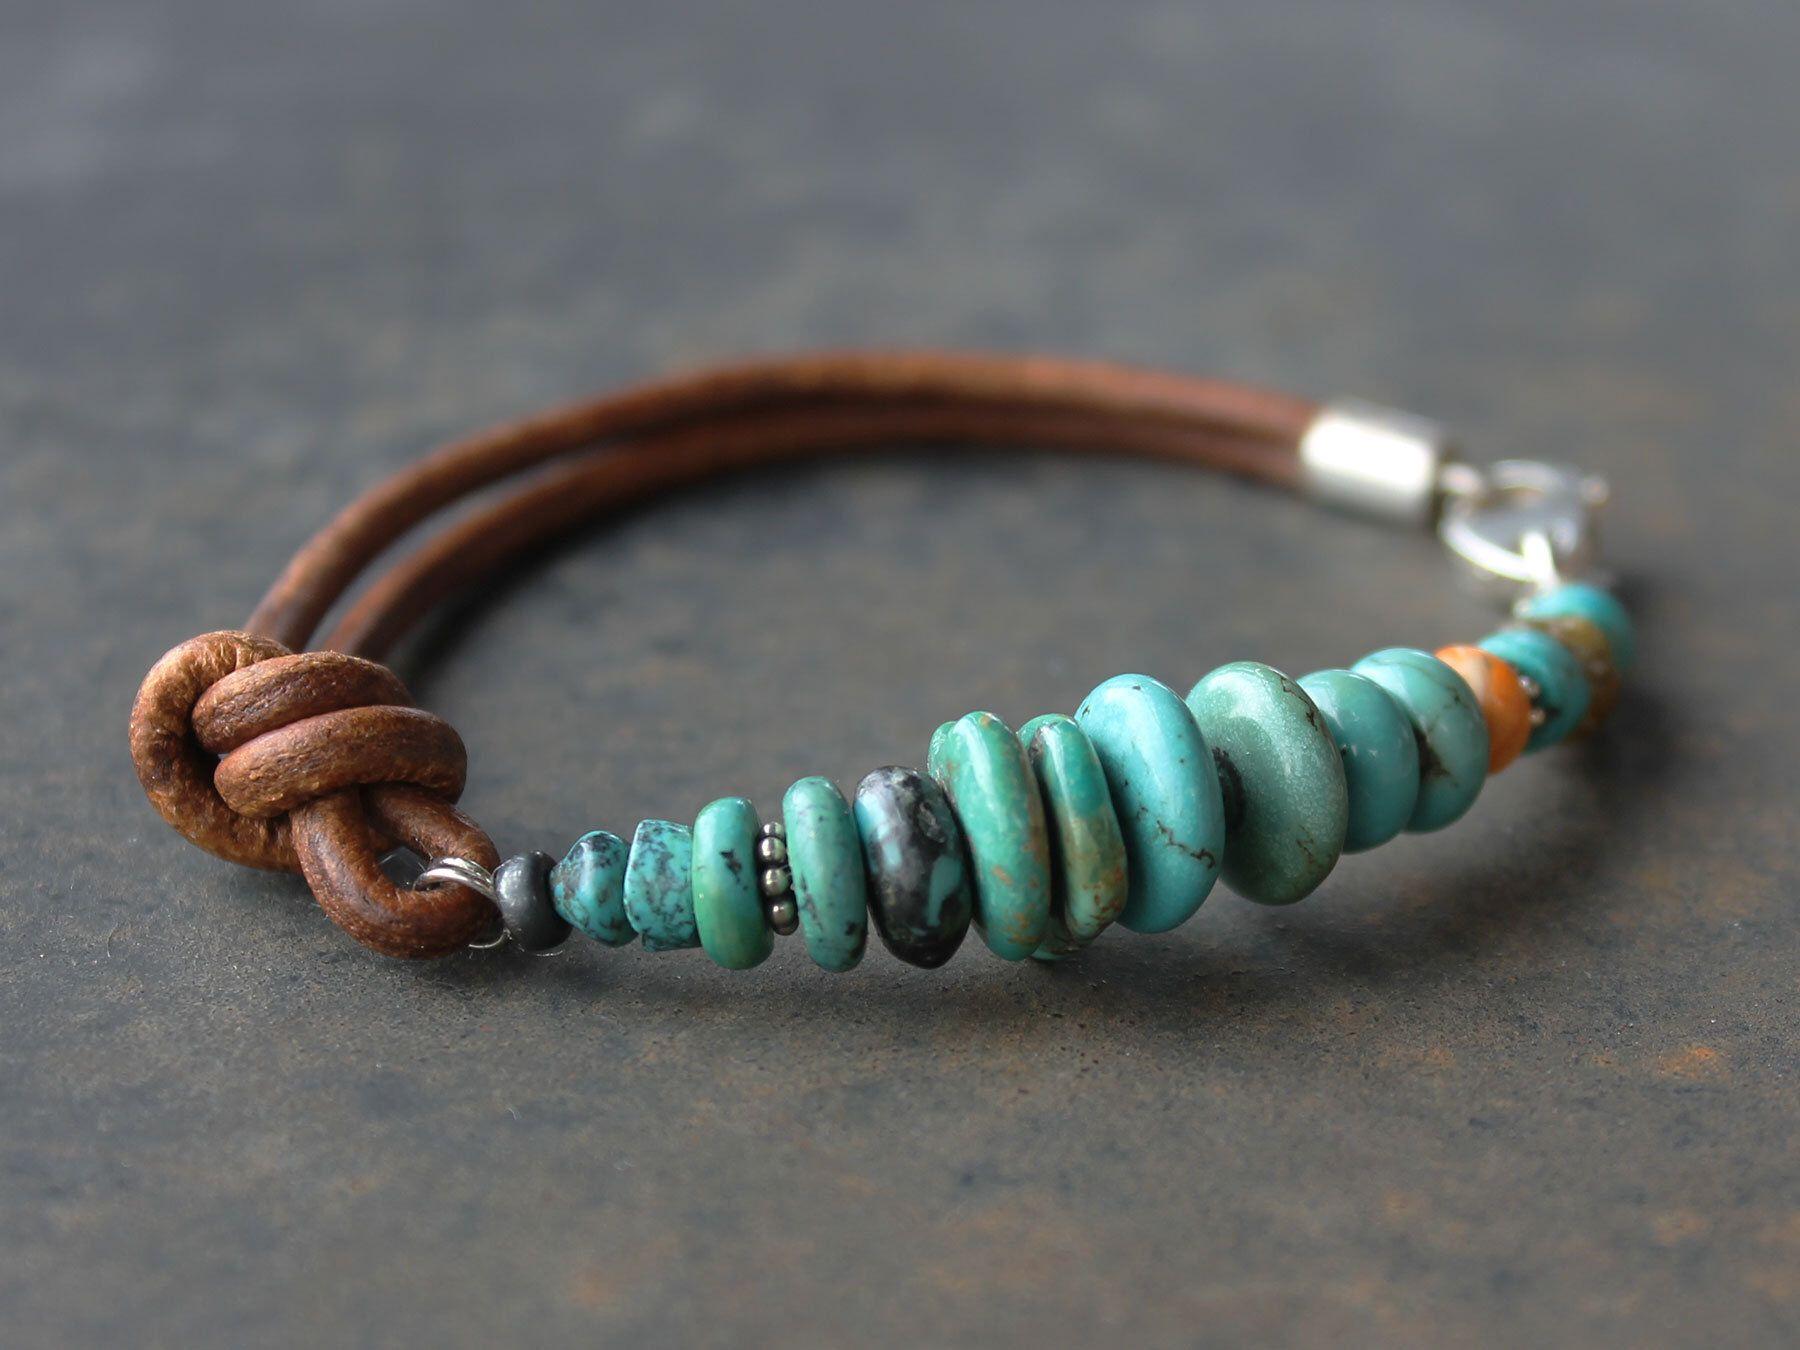 Fashion Jewelry Logical Turkish Agate Gemstone Ethnic Style Handmade Jewelry Cuff Bracelet Adjustable Bracelets